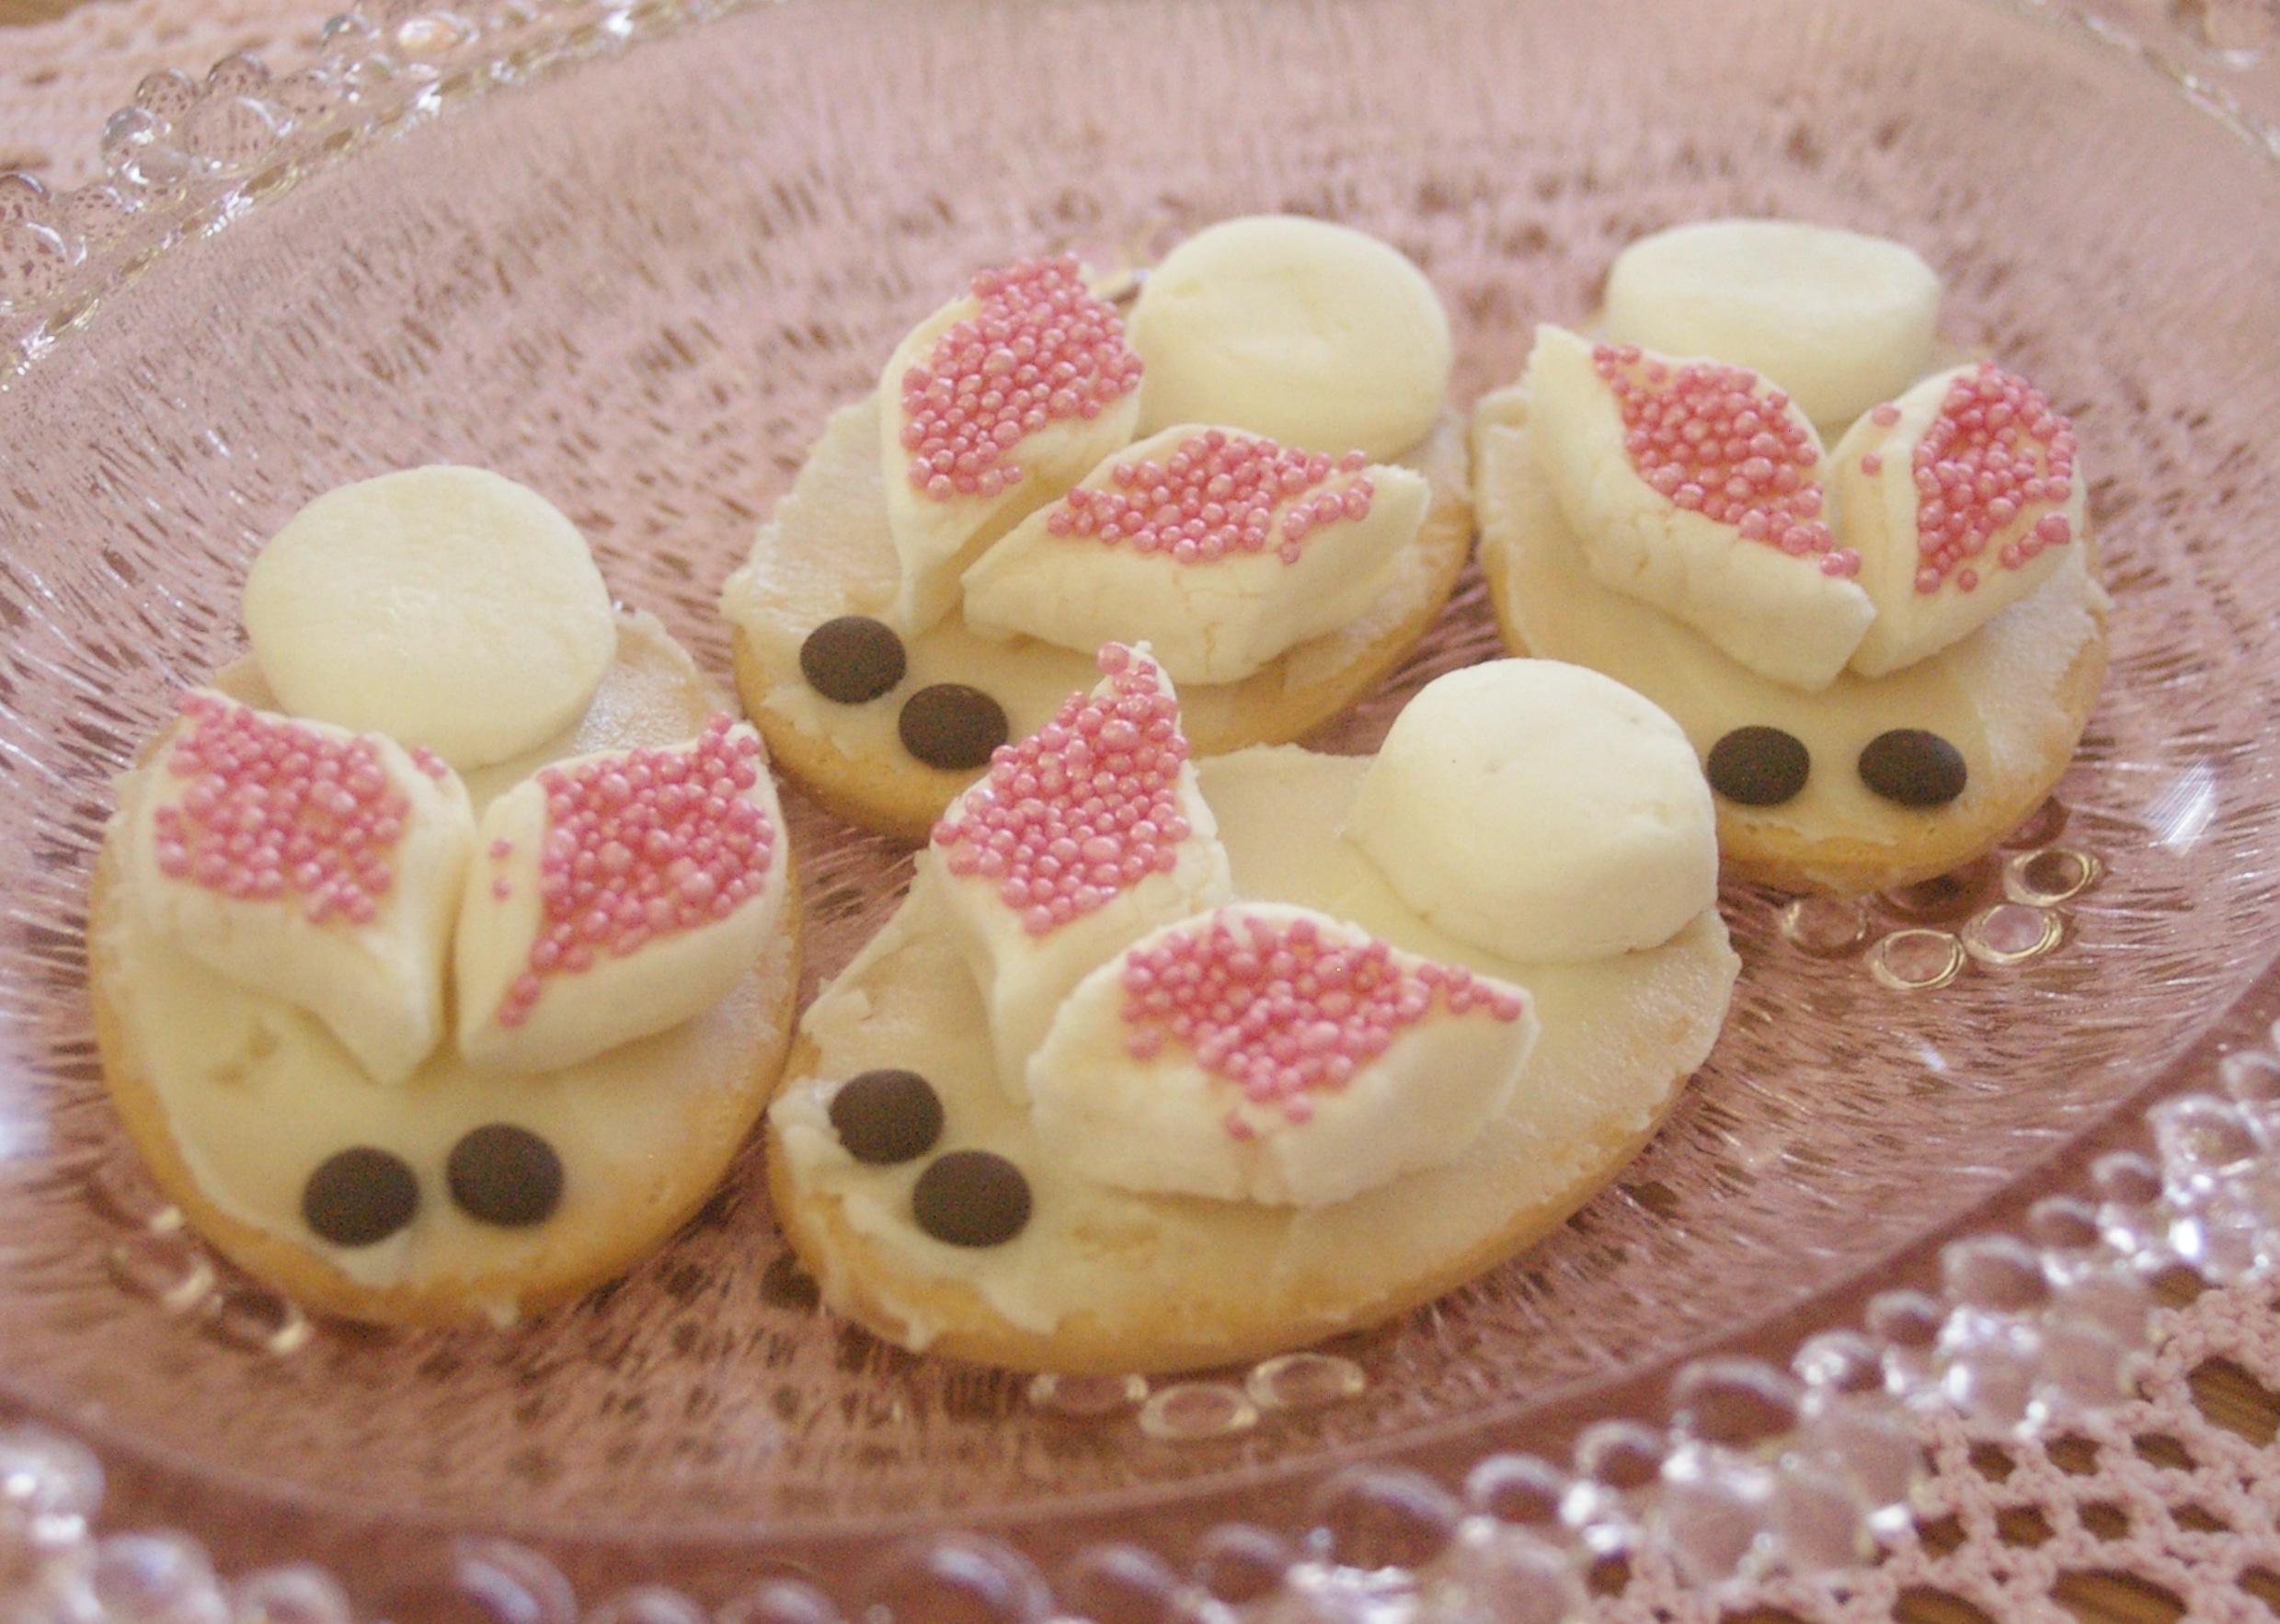 Easter treats bunny milk arrowroots brisbane kids easter treats bunny milk arrowroots negle Images